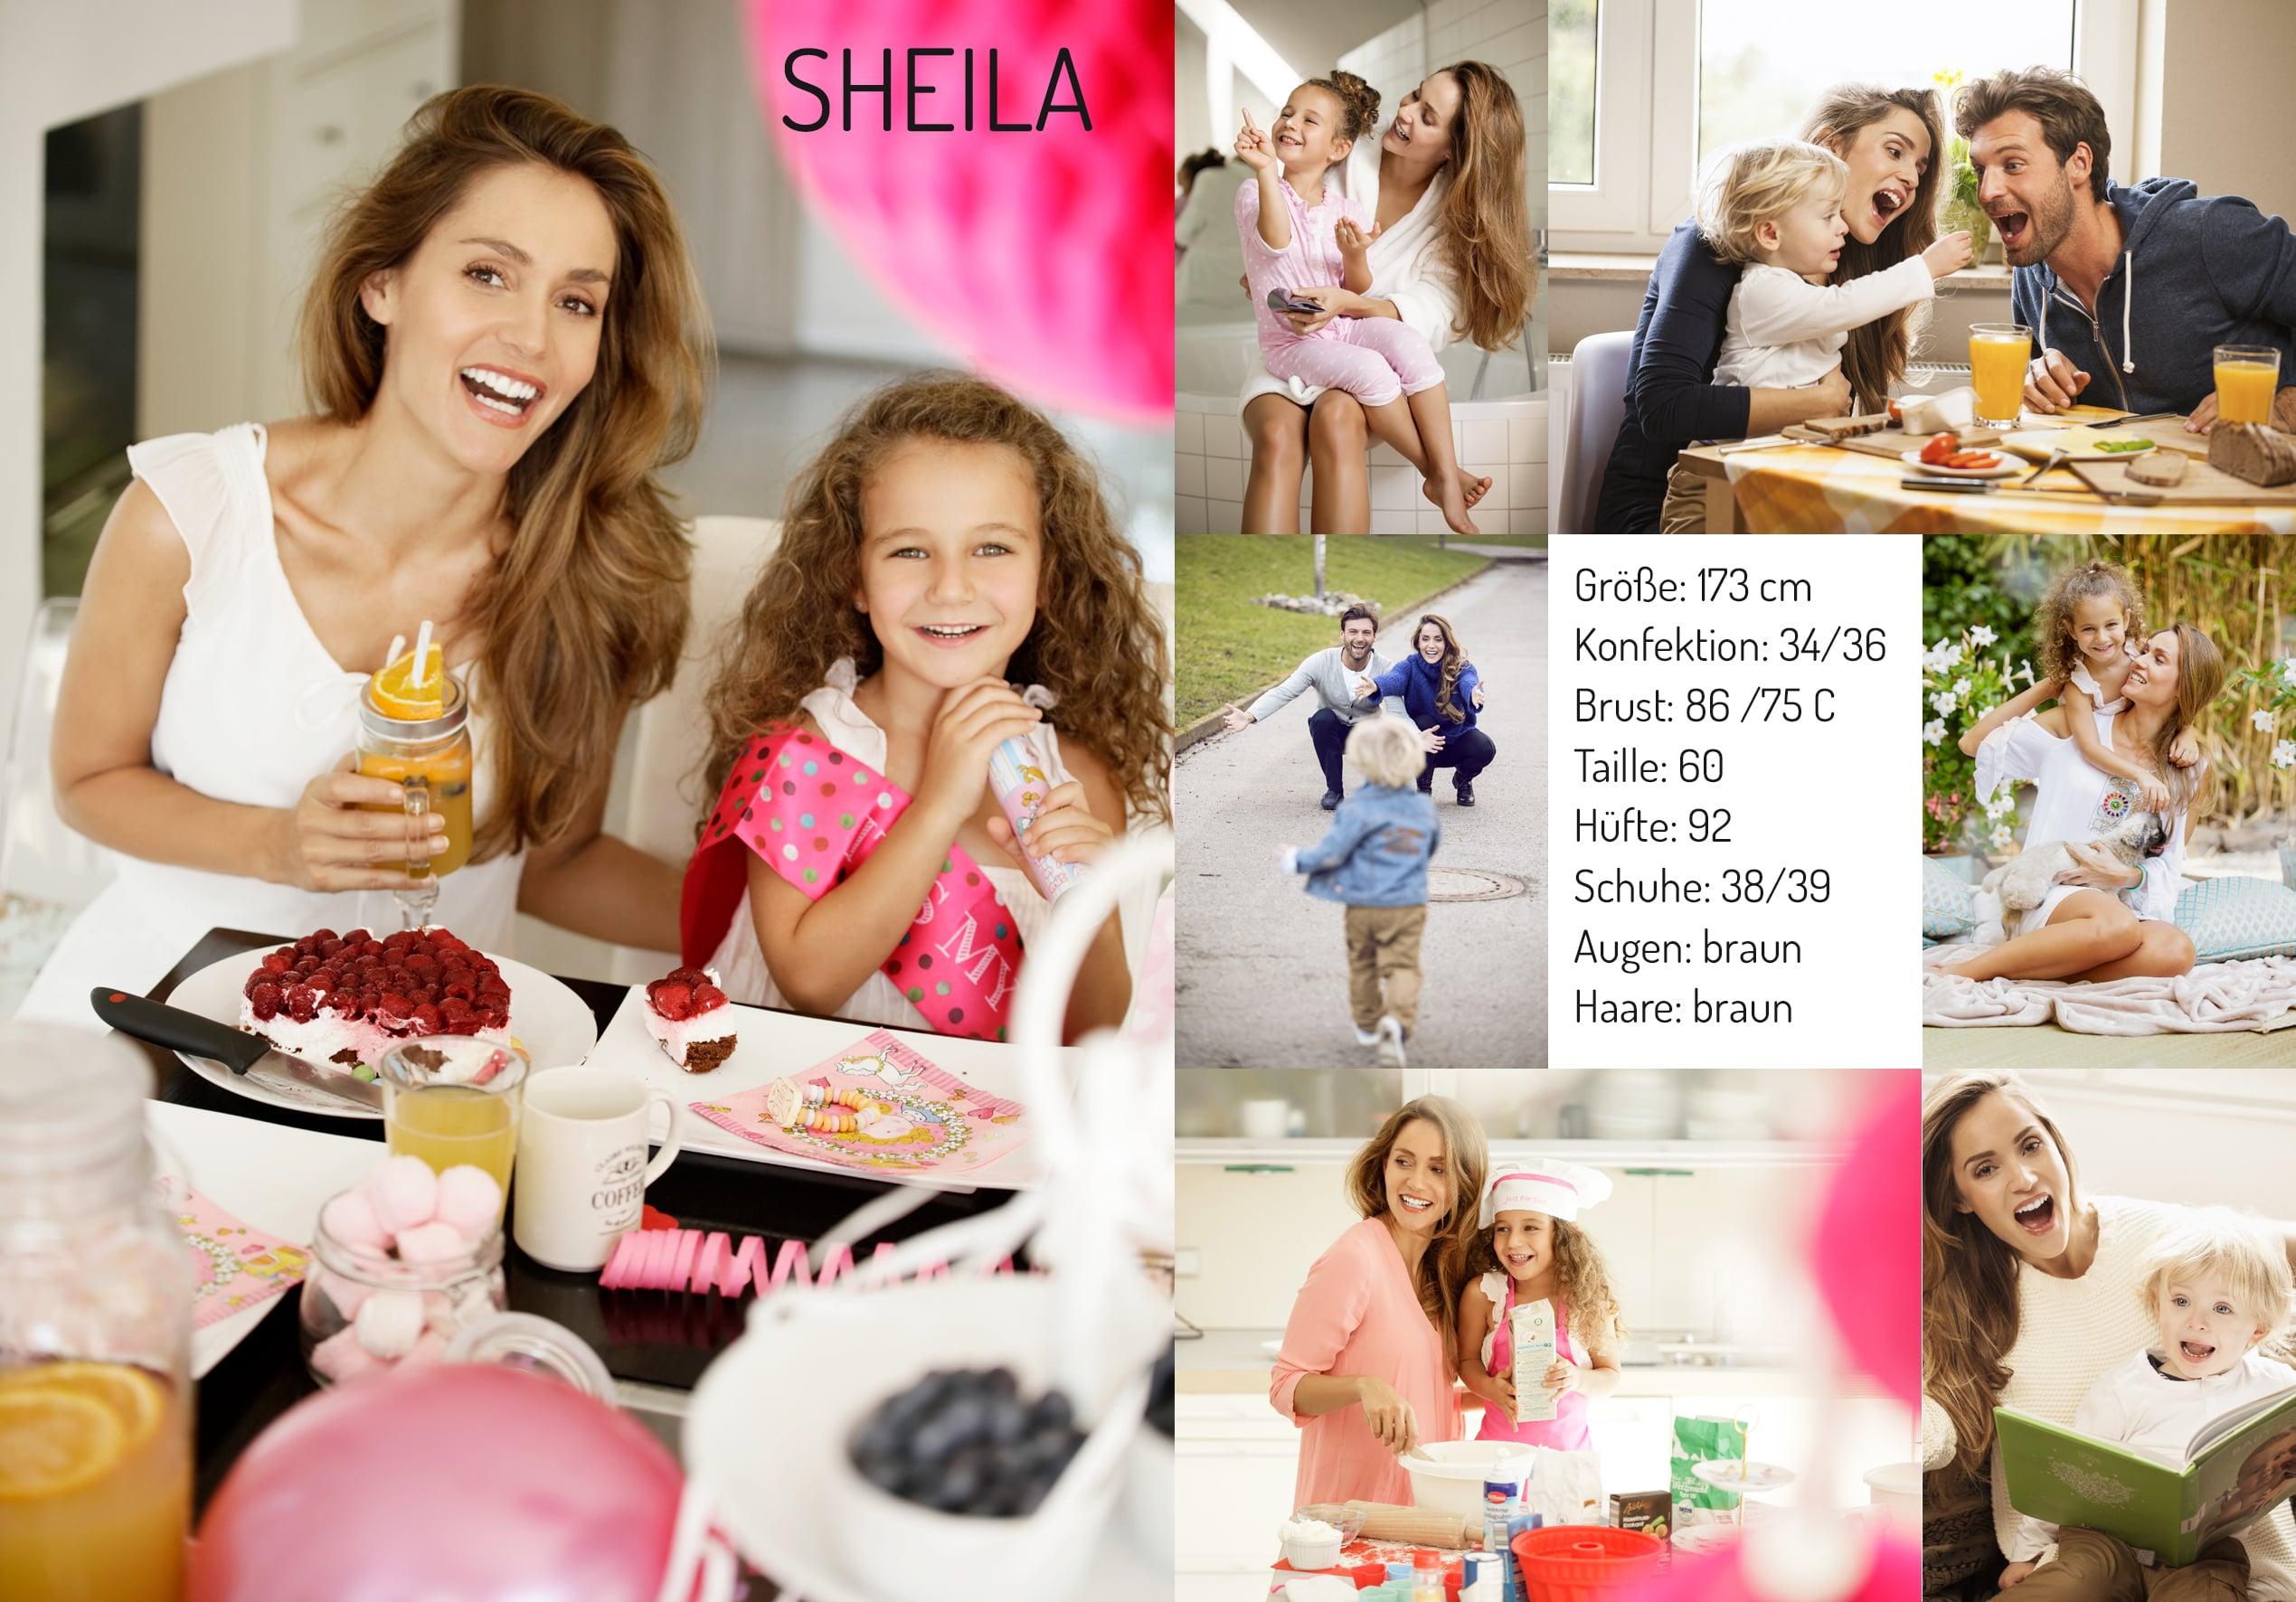 sedcard-sheila